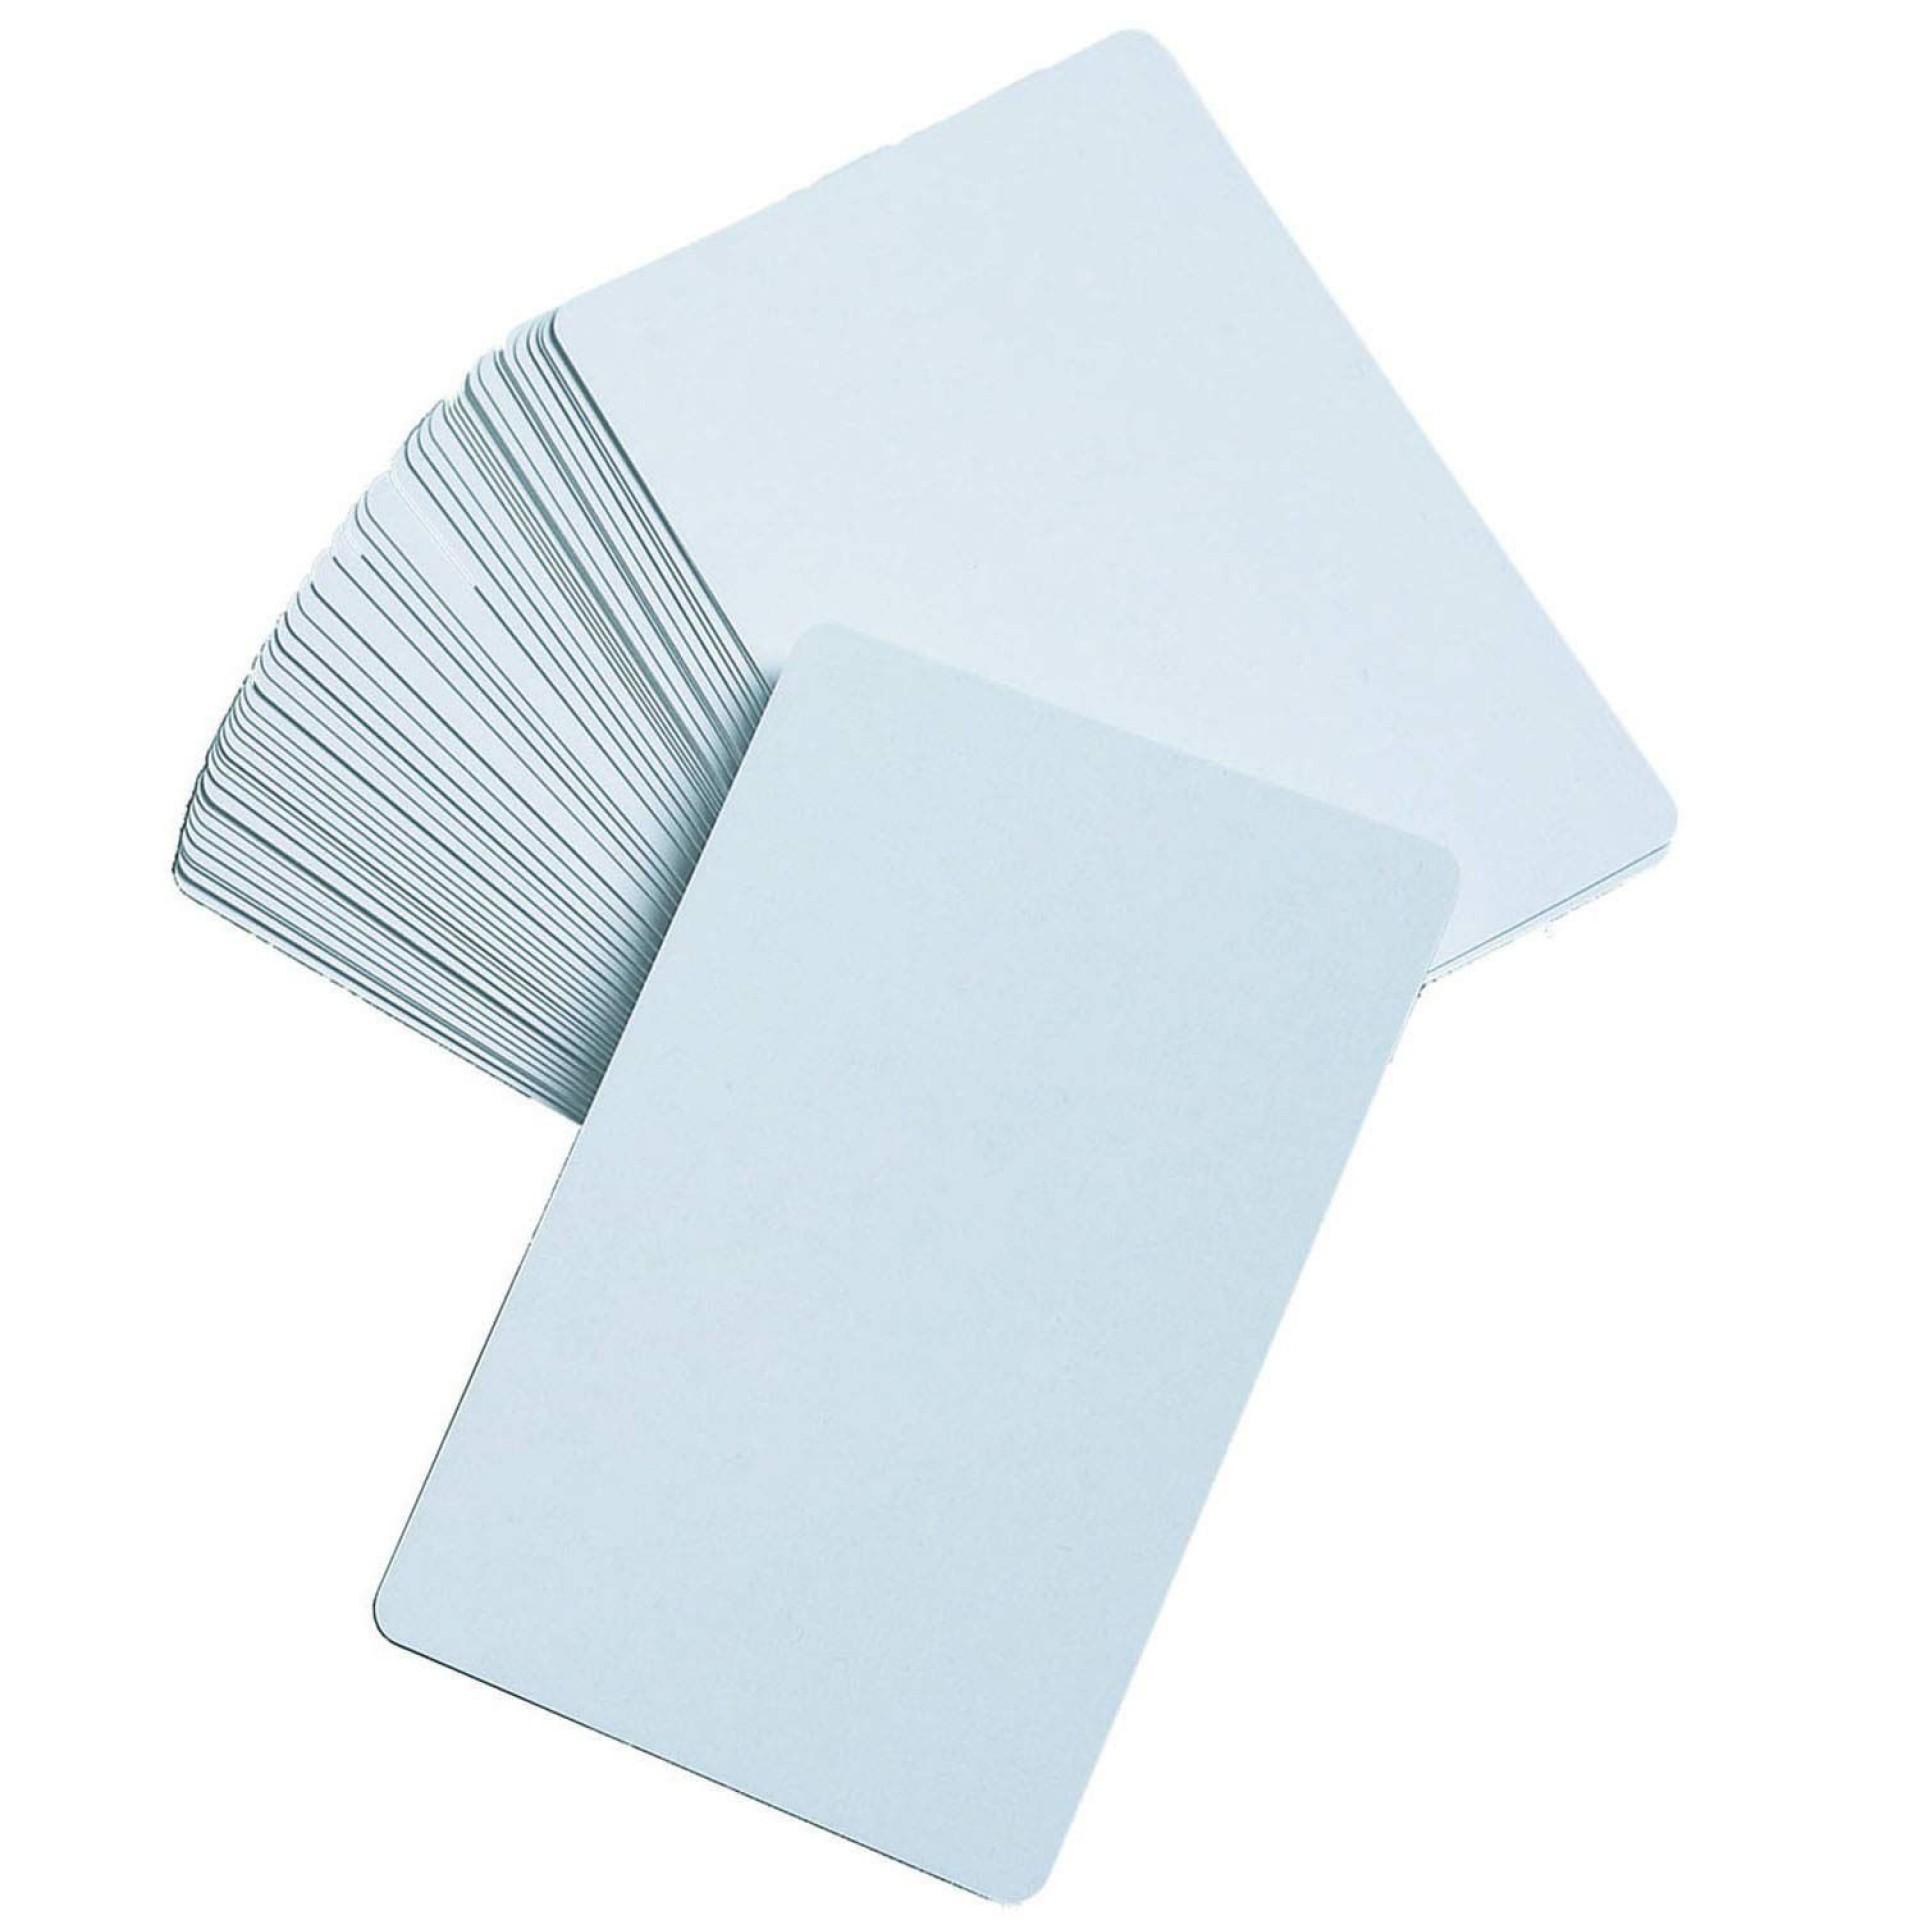 000 Wonderful Blank Playing Card Template Word High Def 1920